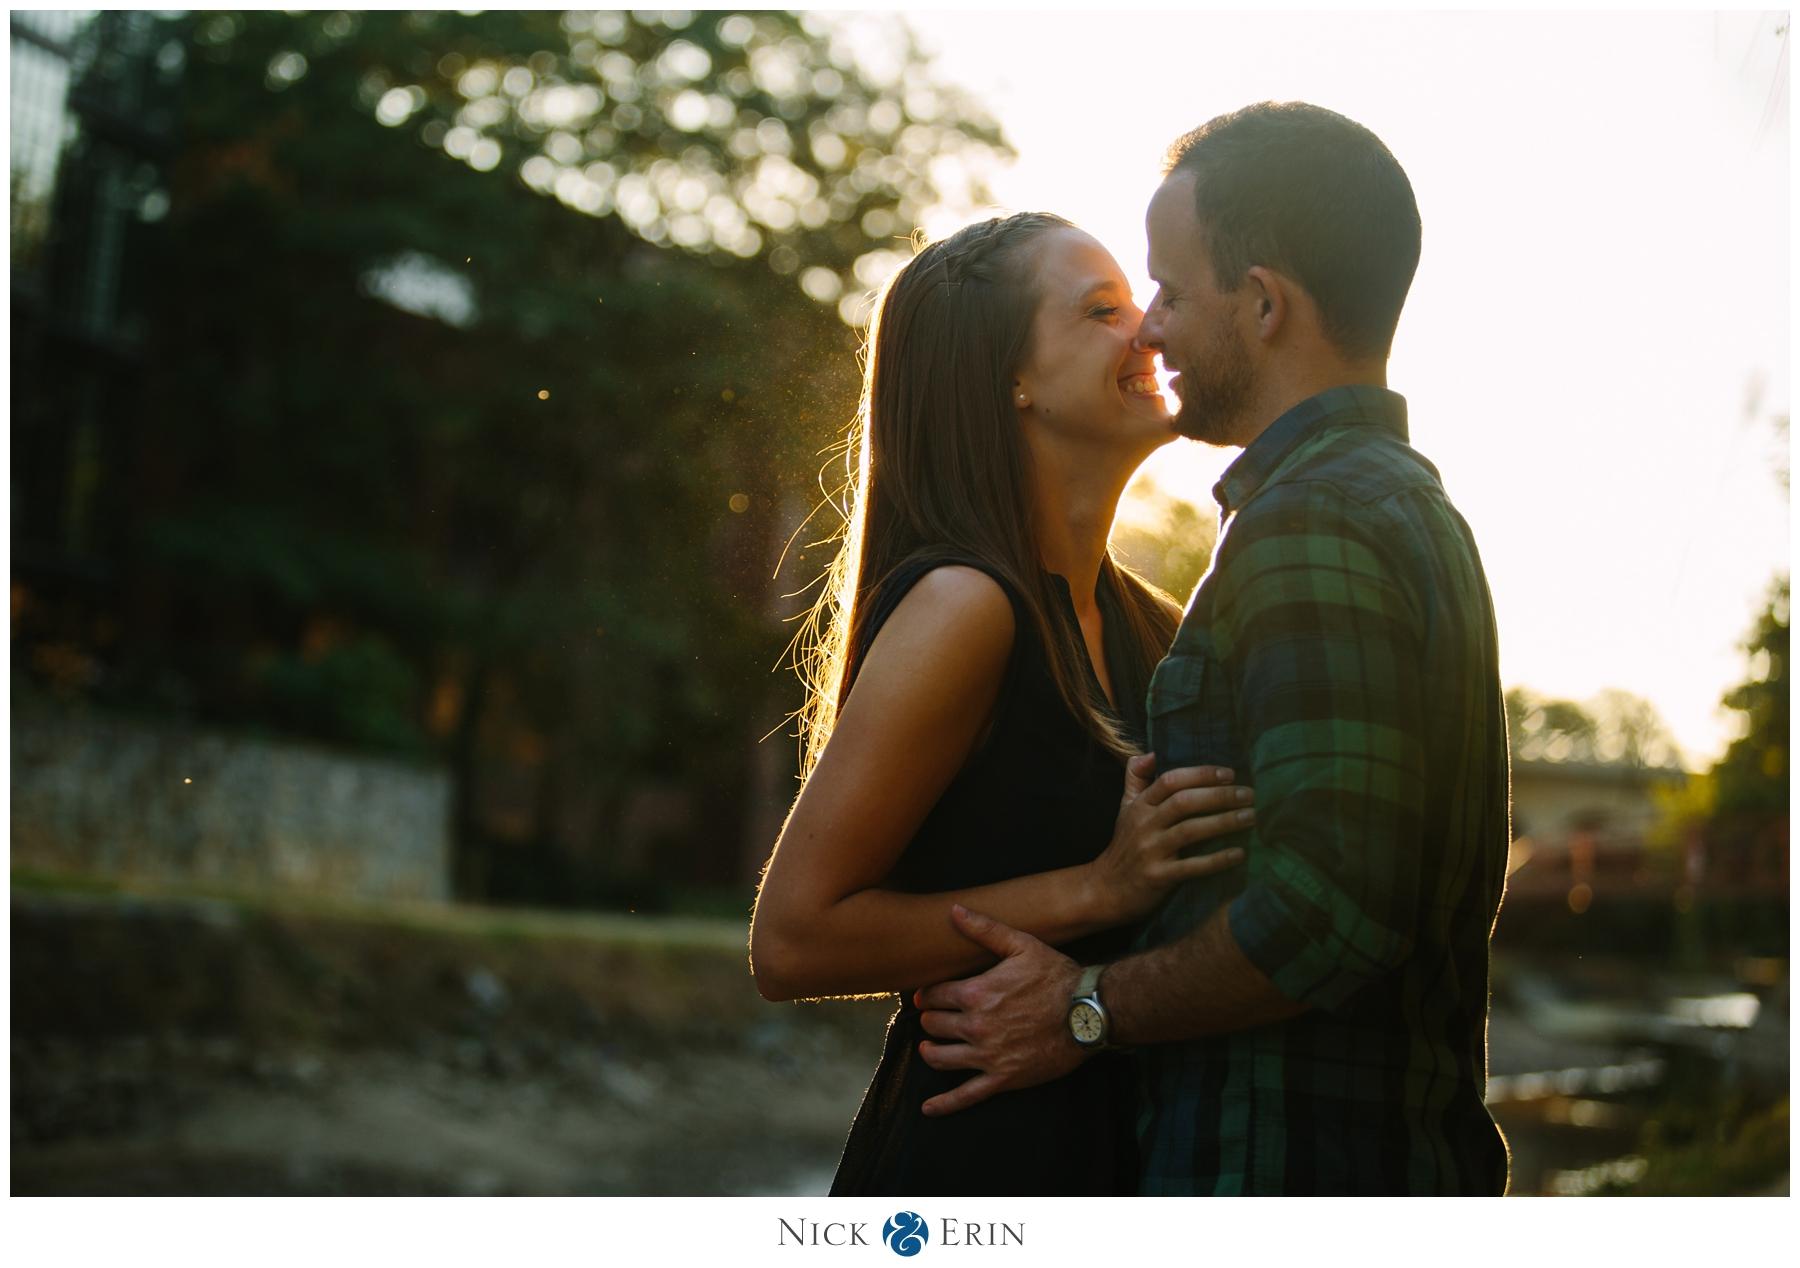 donner_photography_washington-dc-engagement_ashlyn-dan_0007